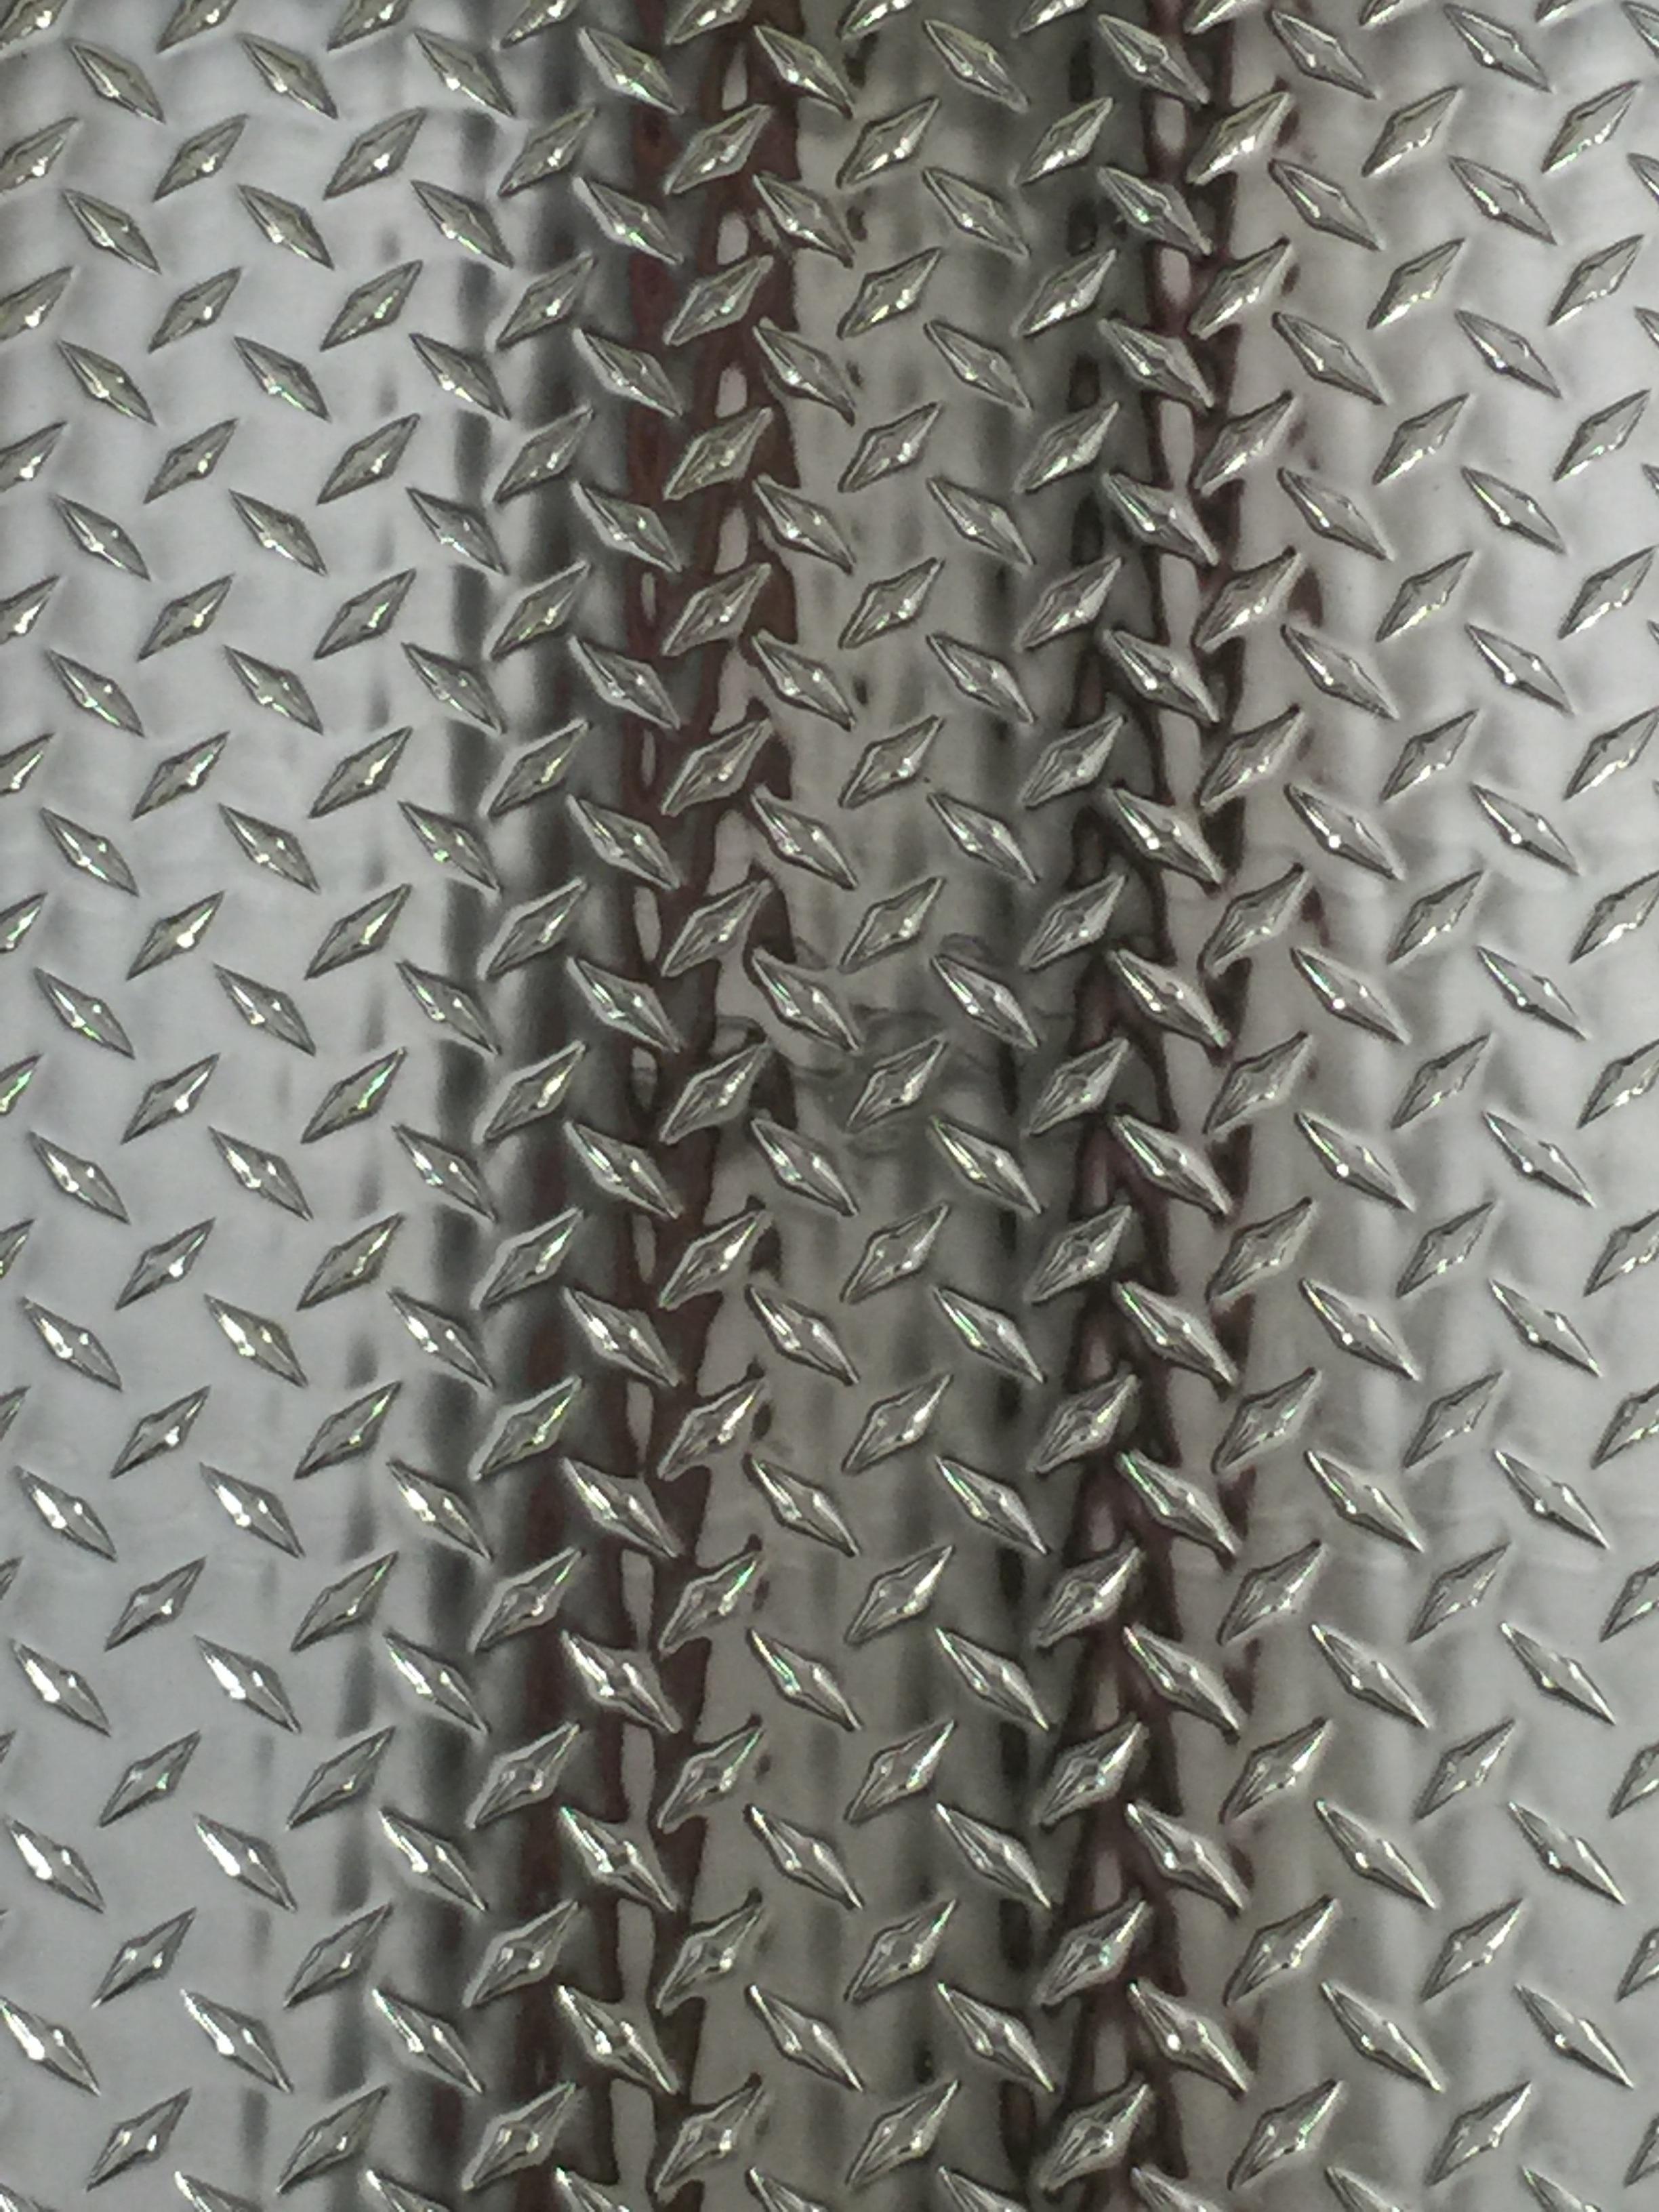 Free Images : technology, wheel, floor, pattern, equipment ...